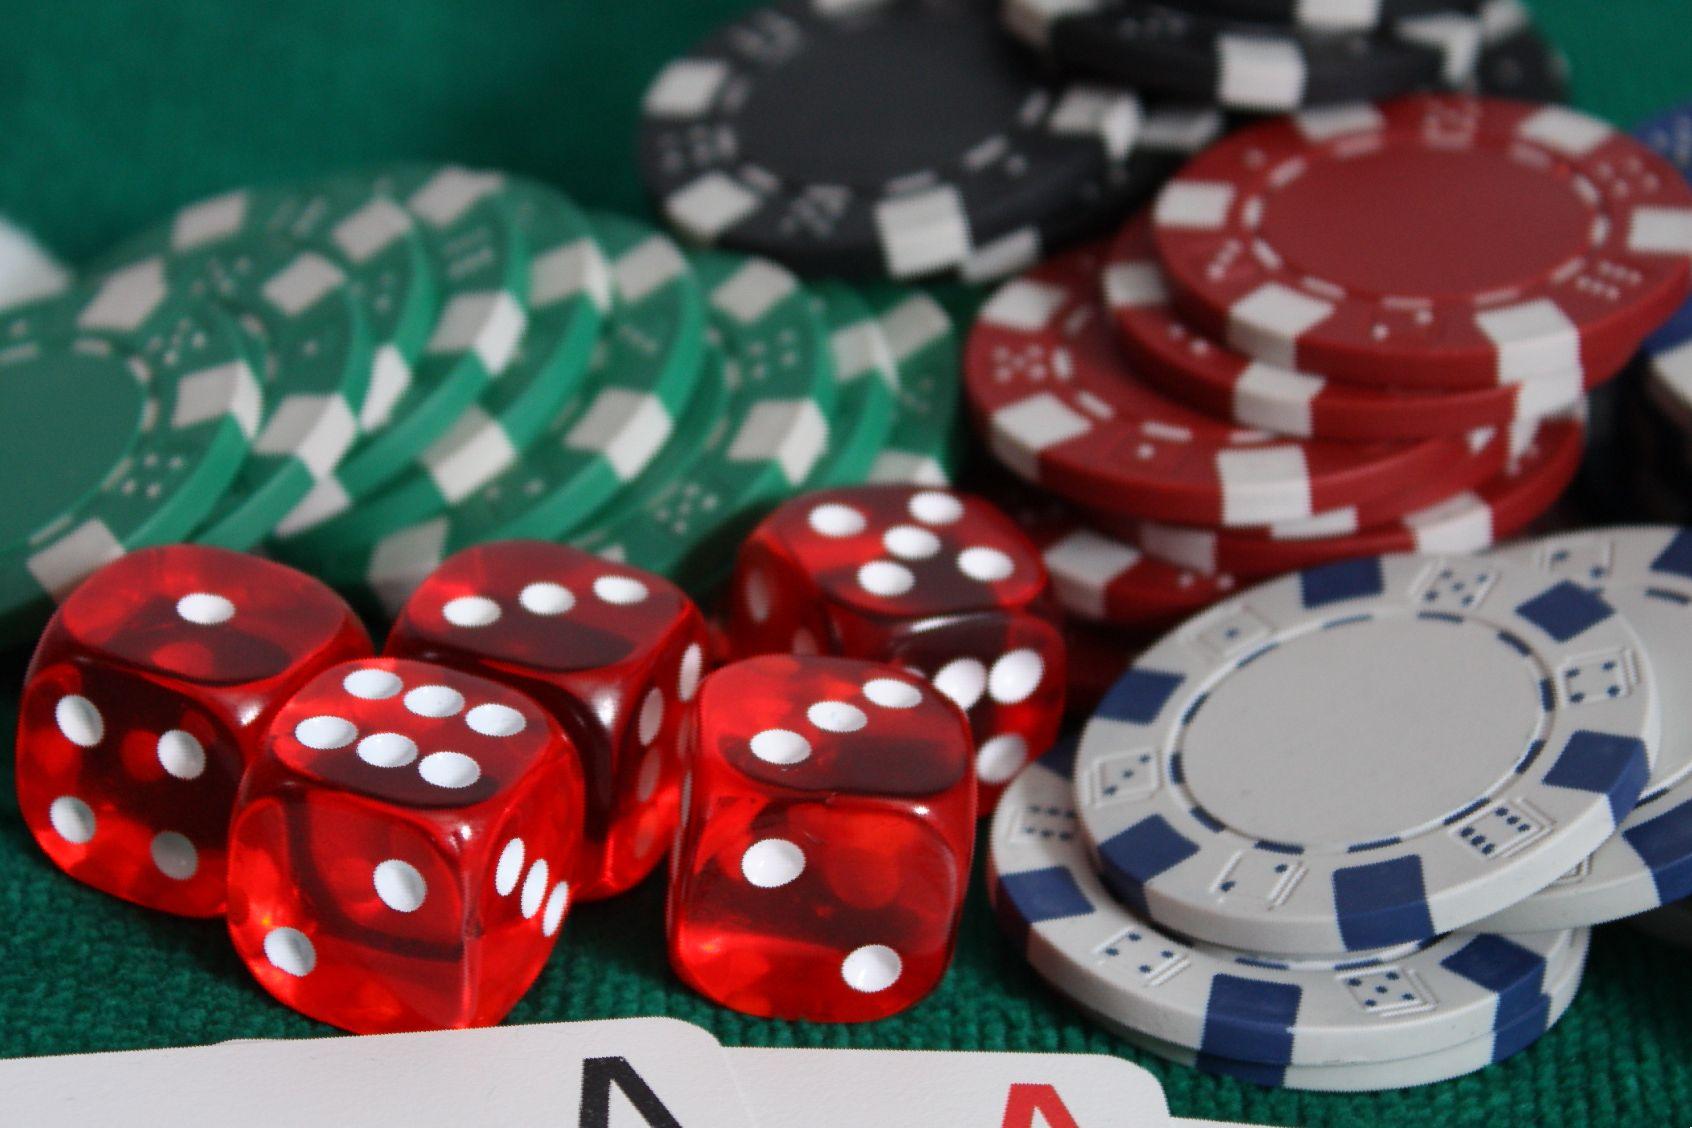 bonuses in an online casino